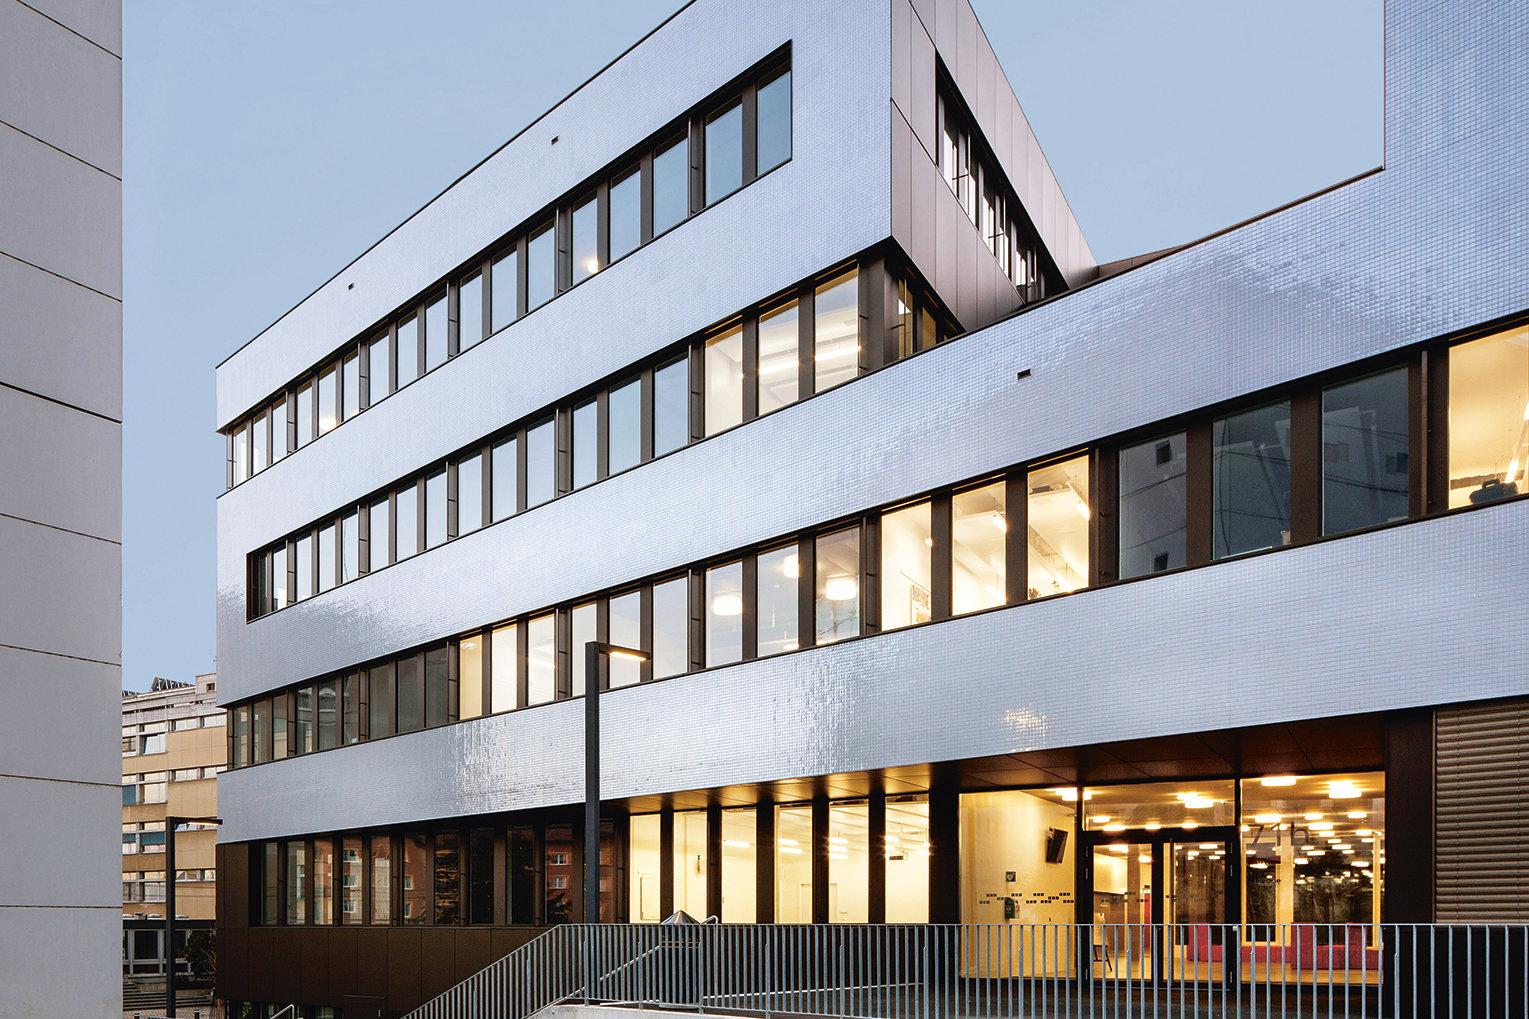 Microcity Neuchatel Sytem-Bauweise, Holz-Beton-Verbund